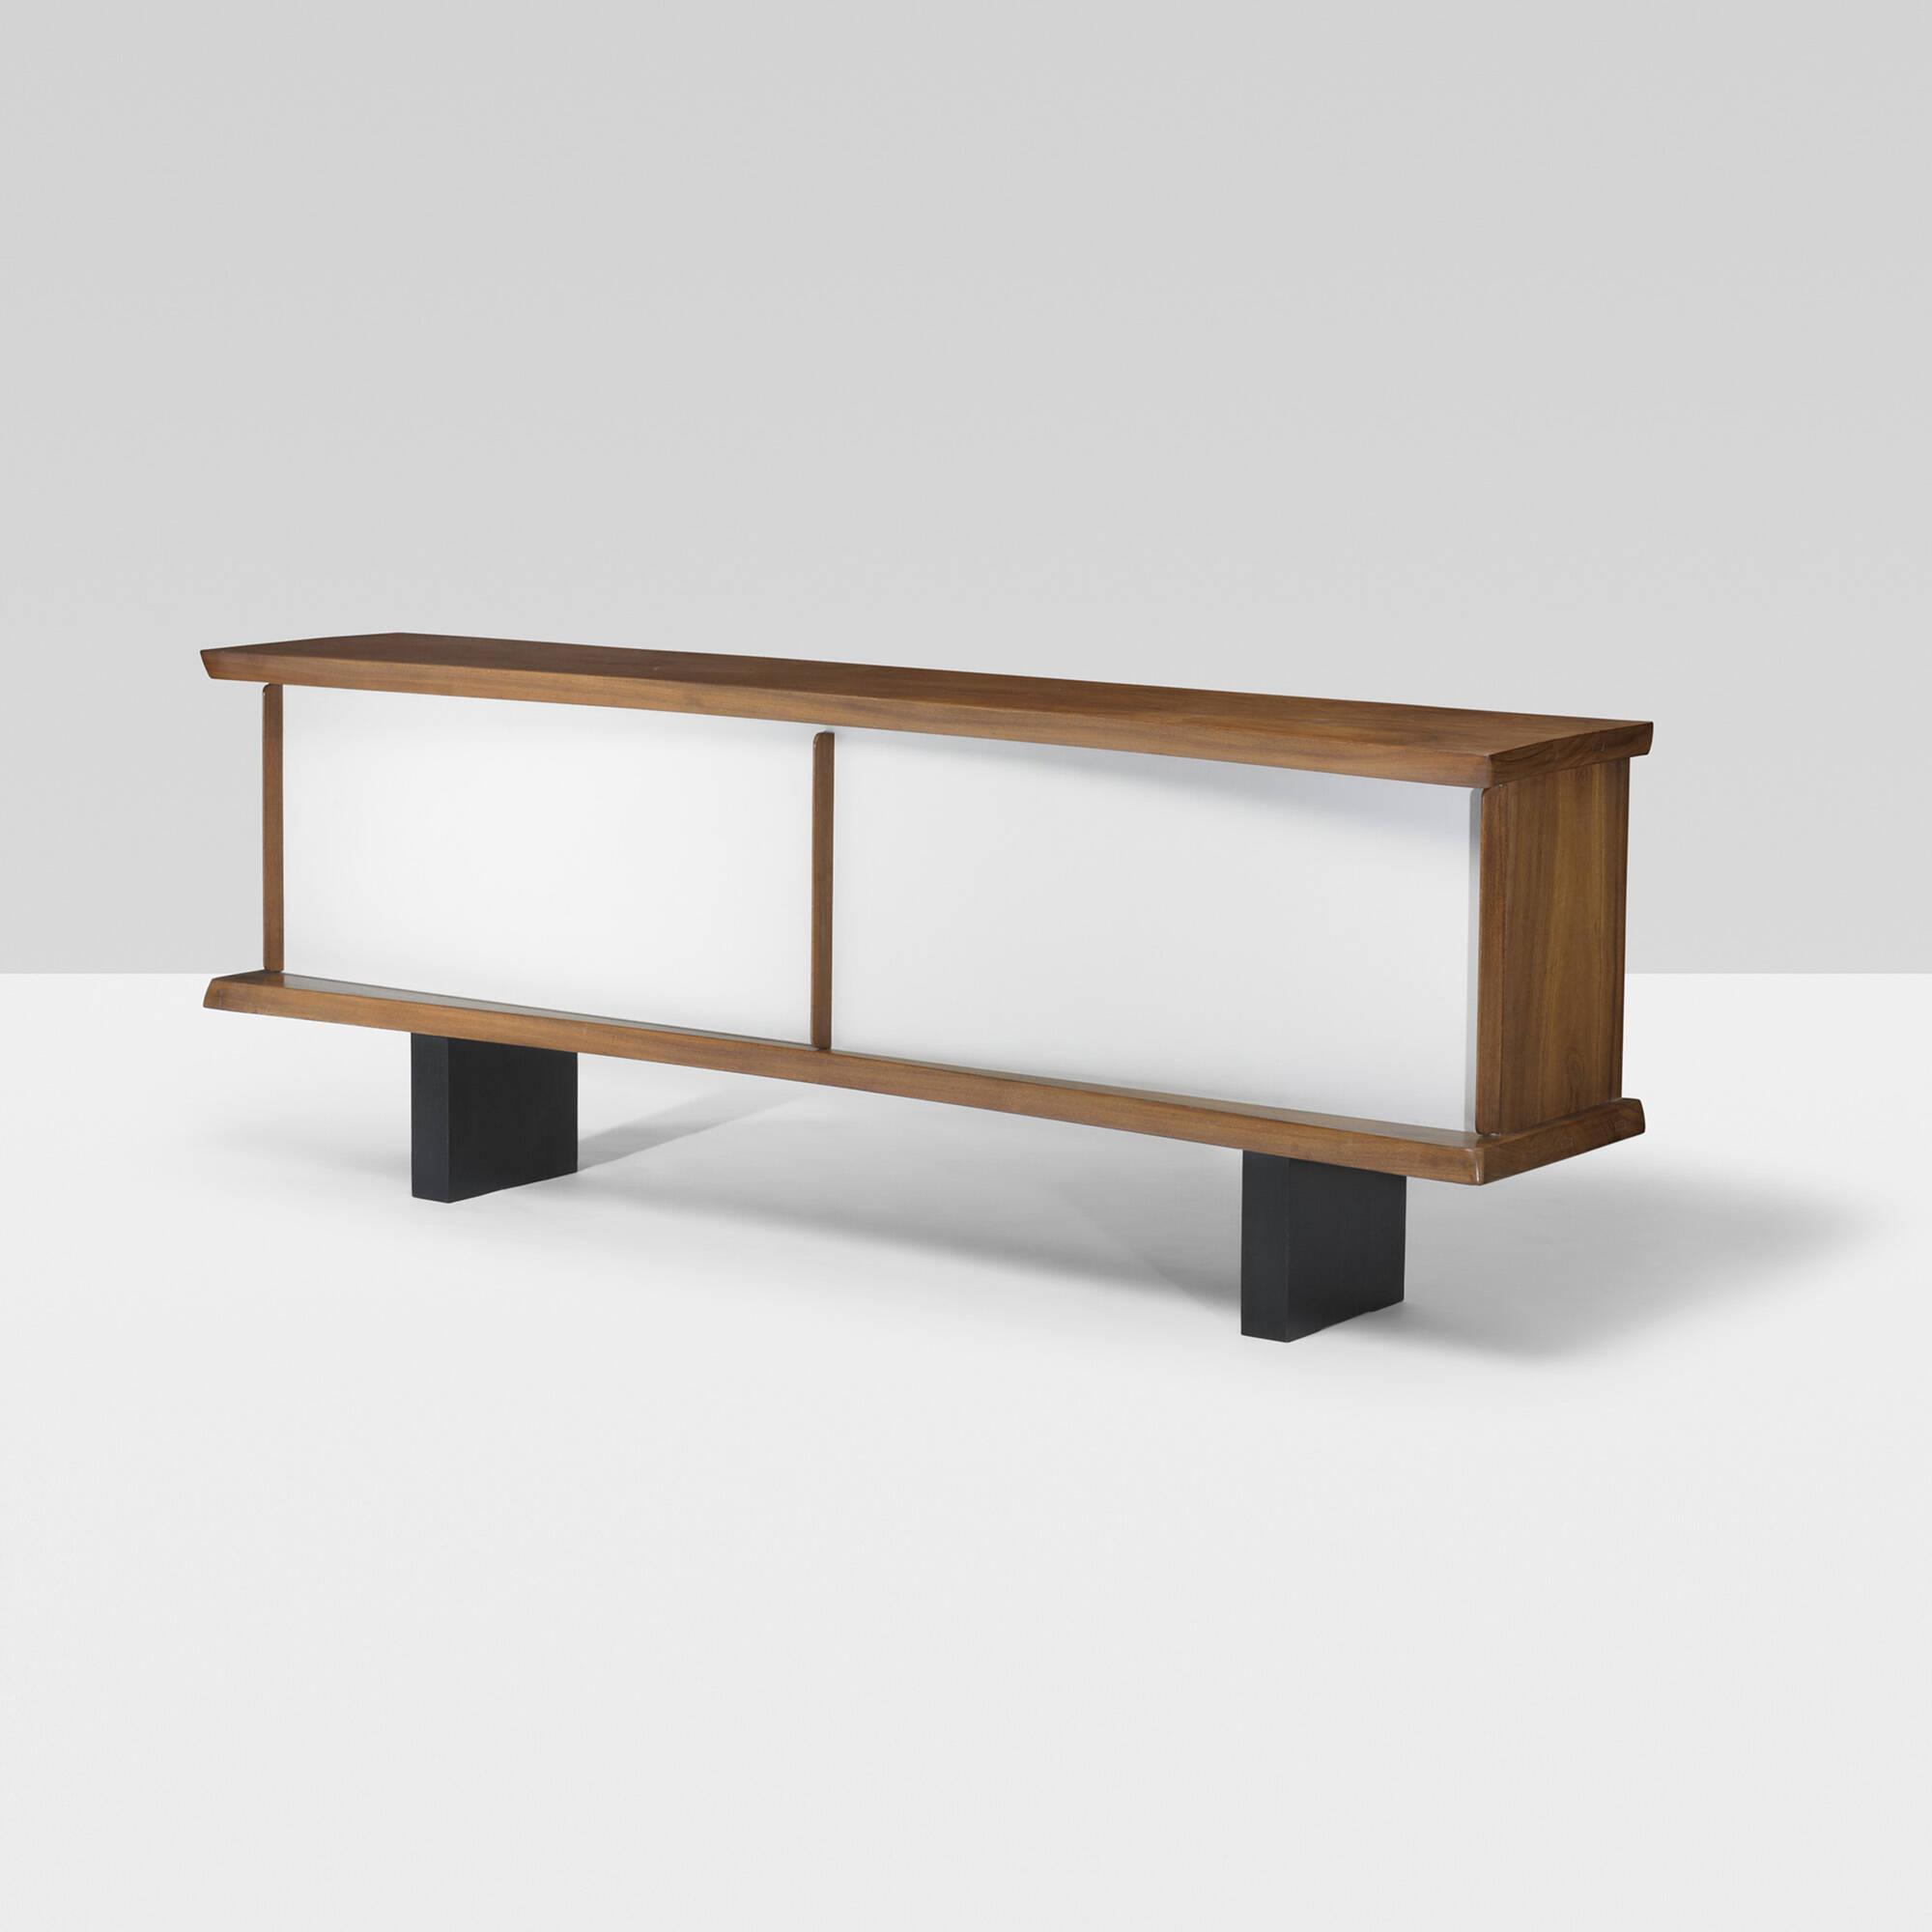 167 charlotte perriand rare bahut. Black Bedroom Furniture Sets. Home Design Ideas